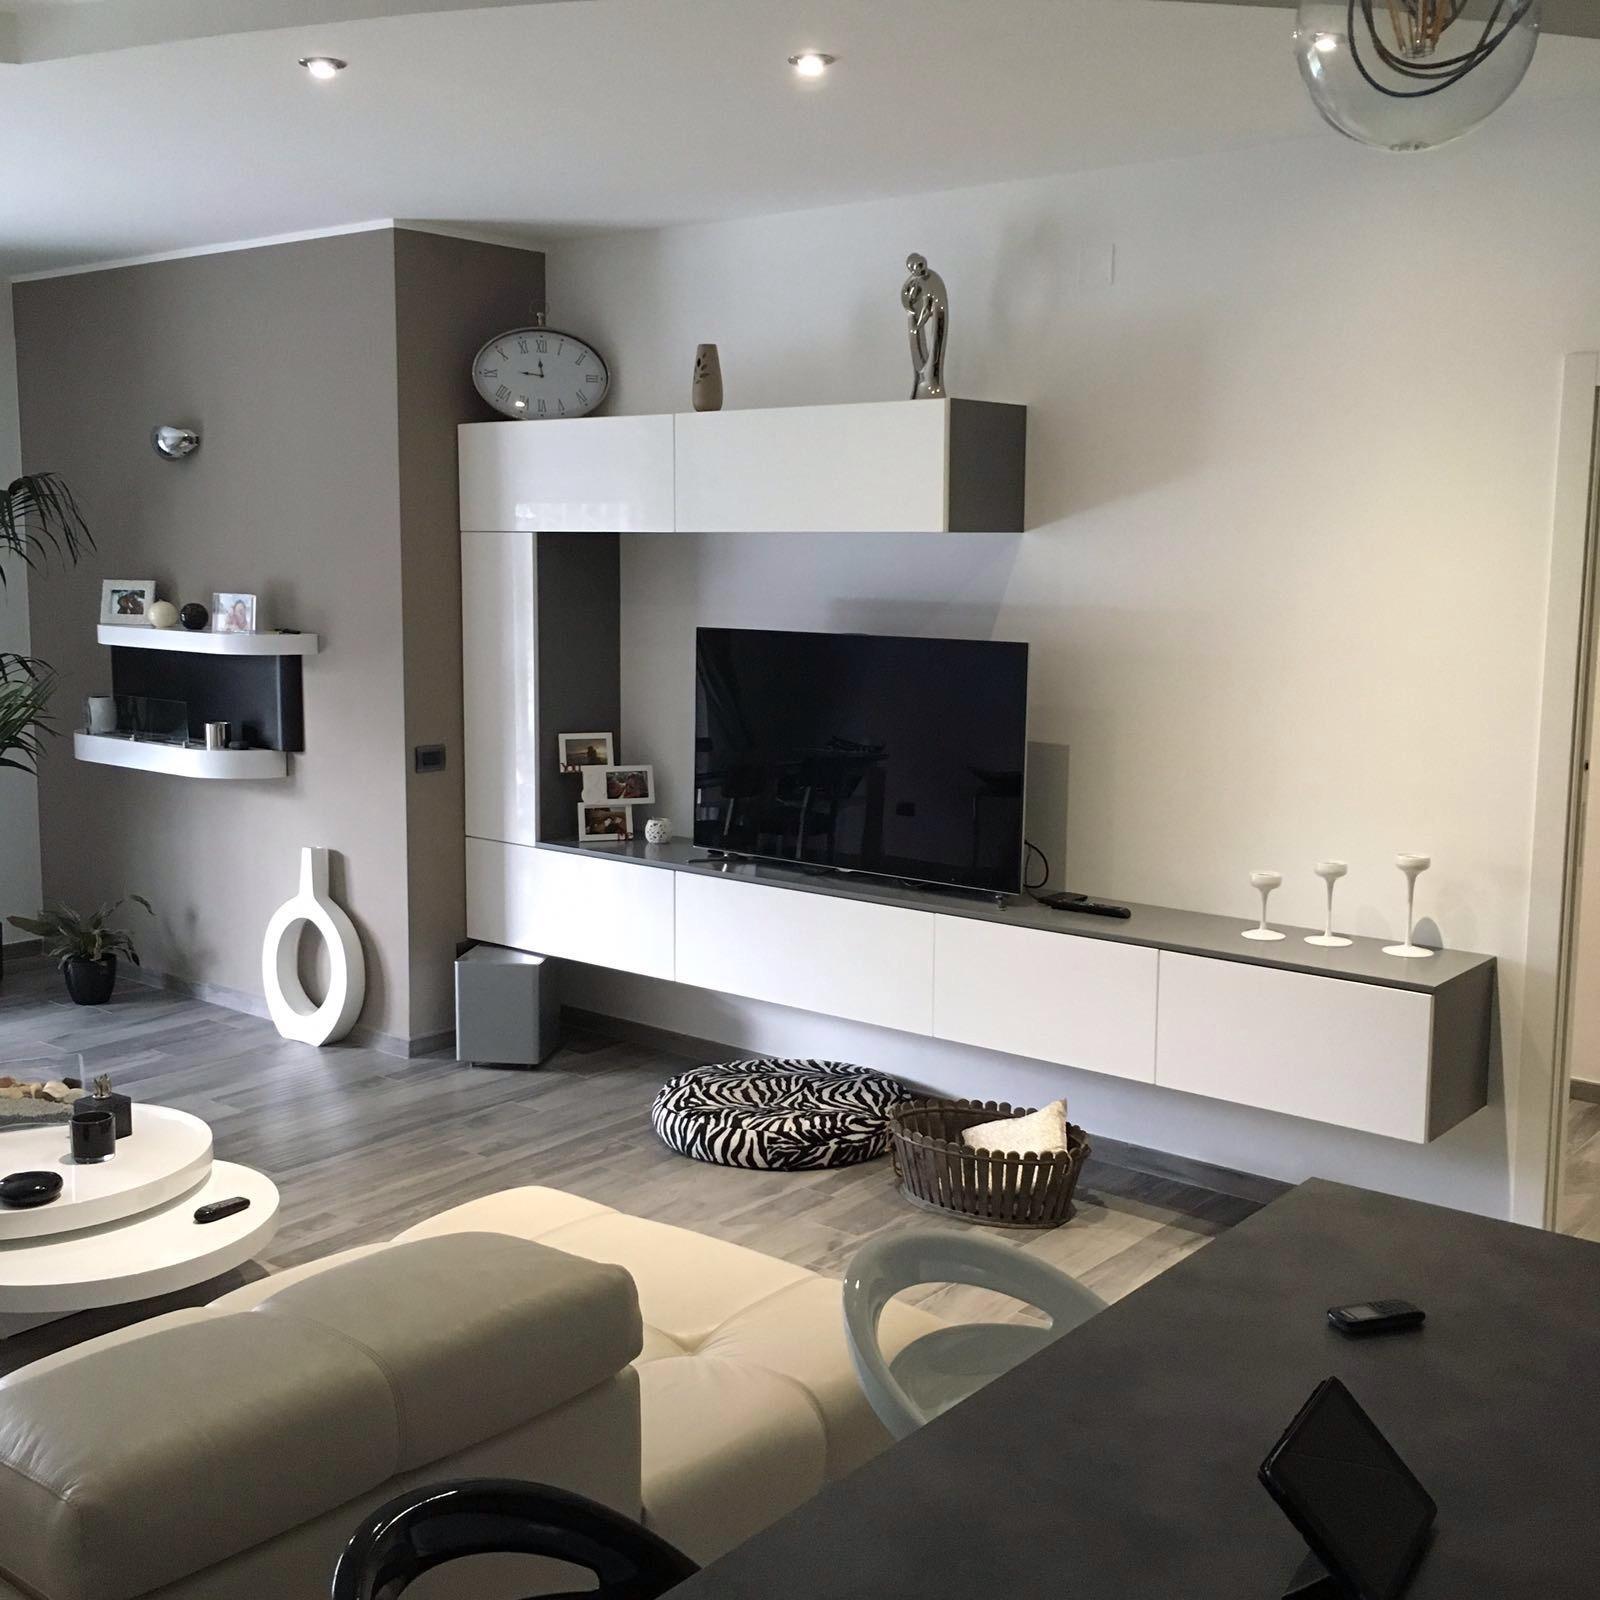 Cucina e living minimal moderno bianco e antracite | Basile